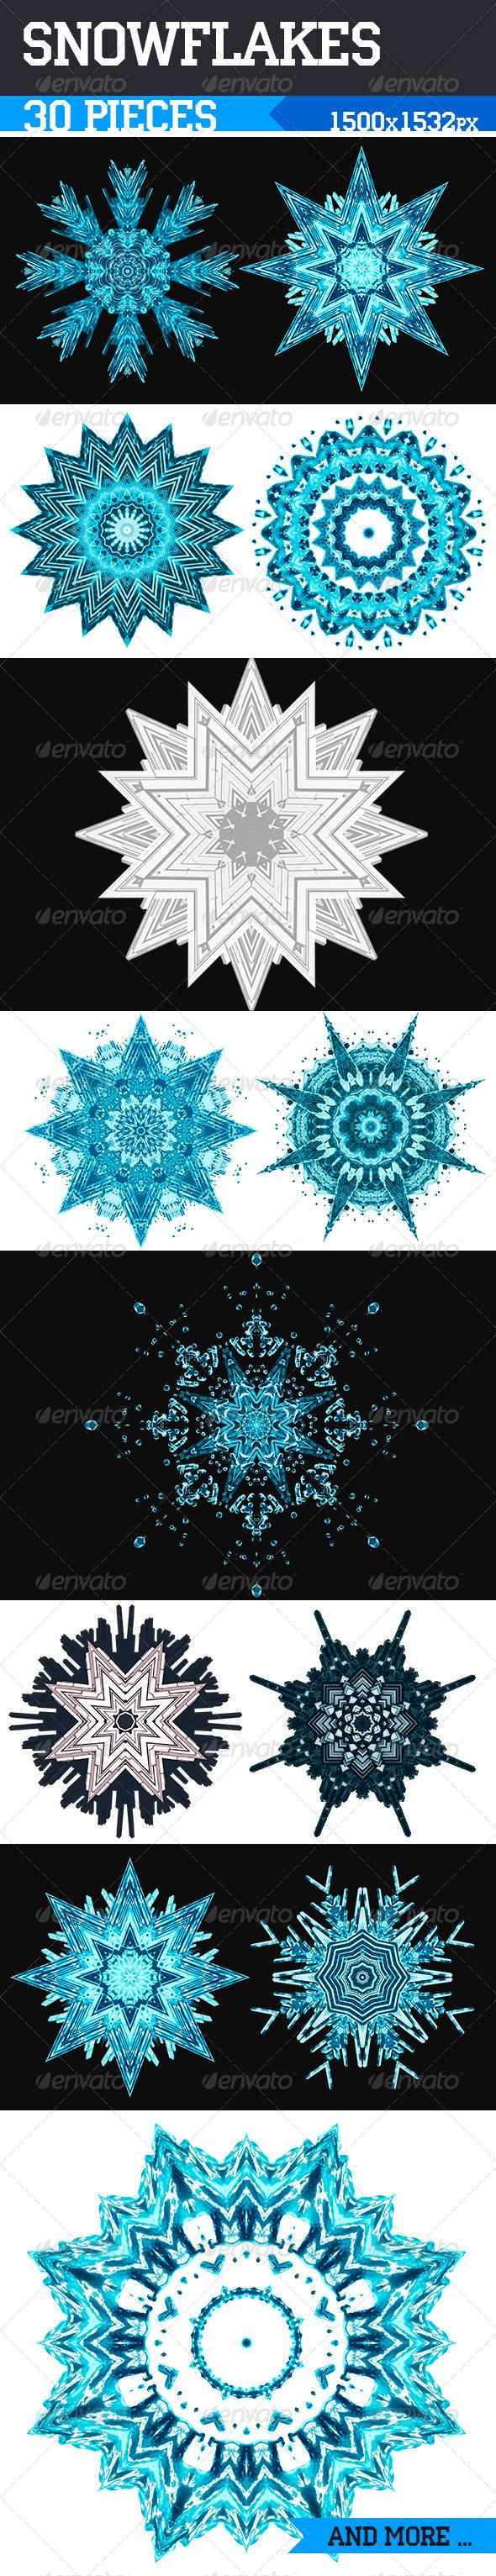 GraphicRiver Snowflakes 6433110